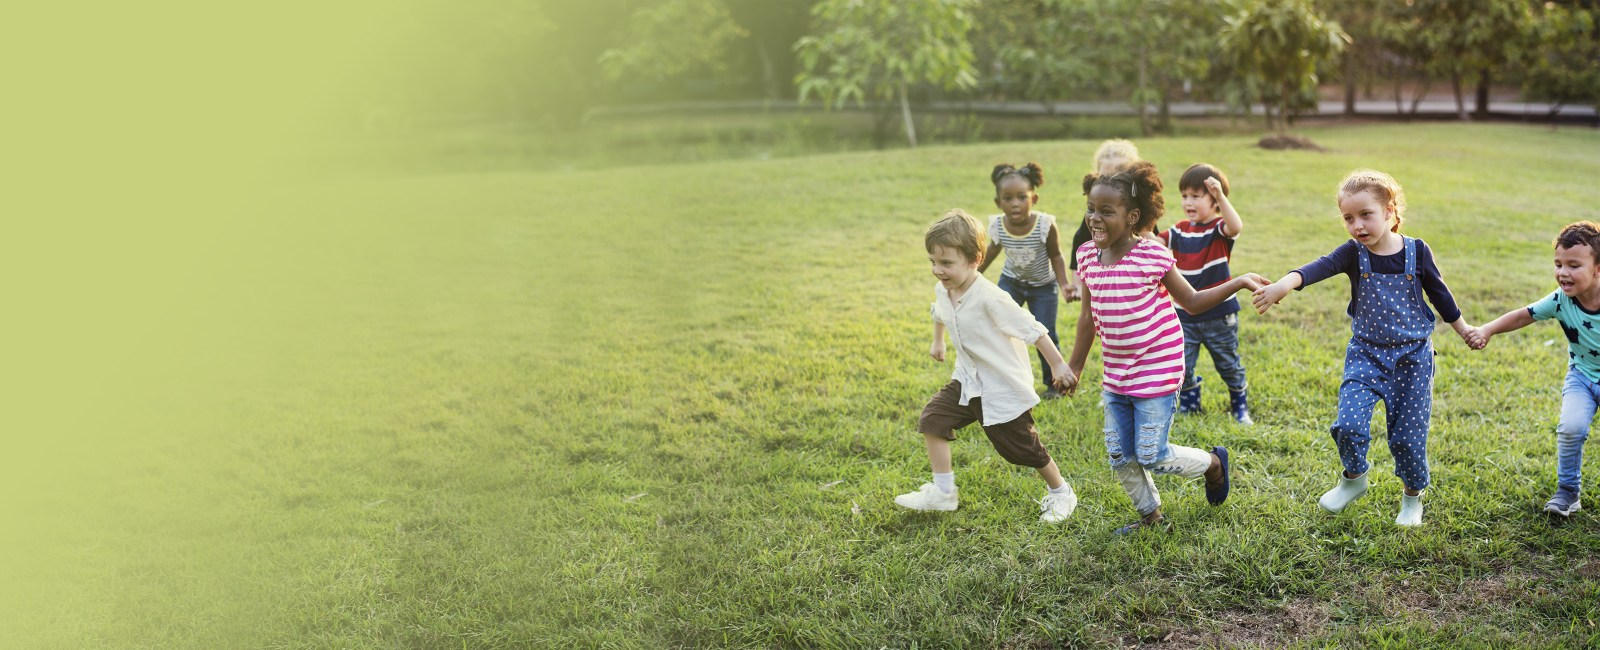 kids running outside together